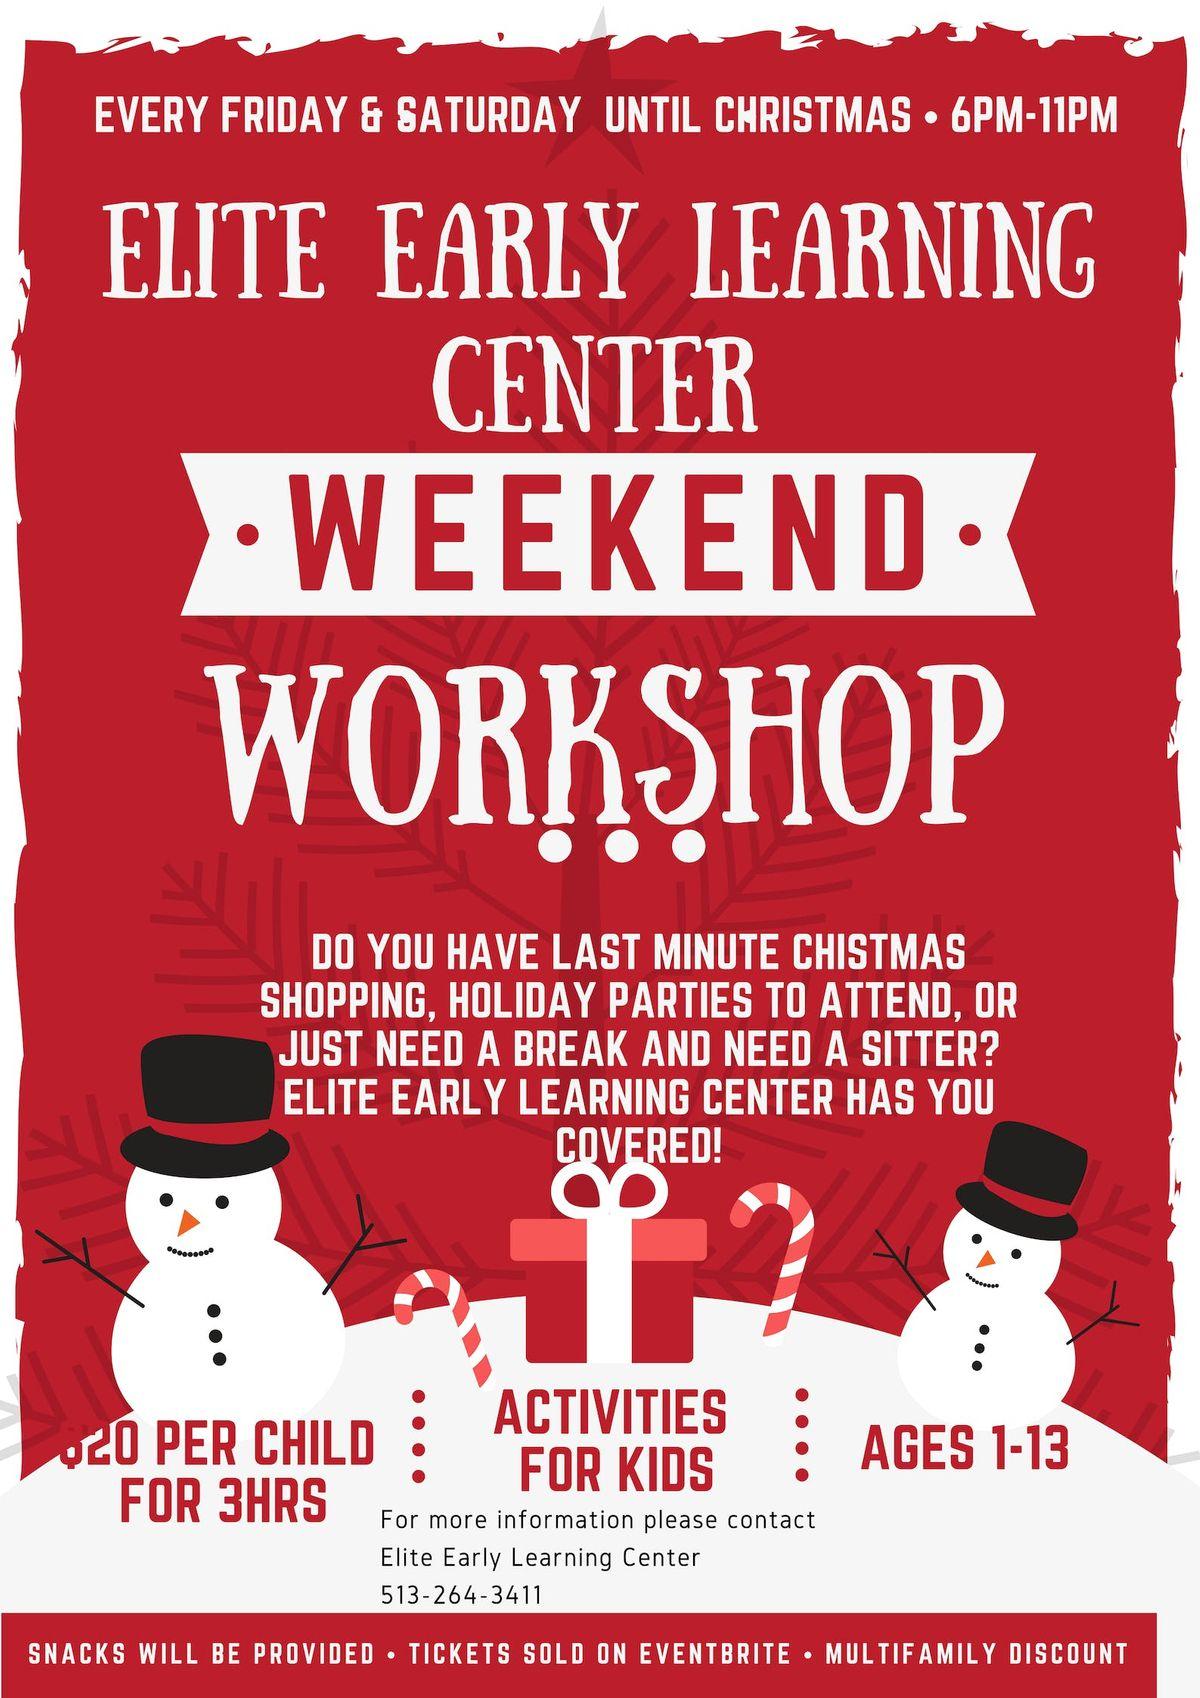 Elite Early Learning Center Weekend Workshop